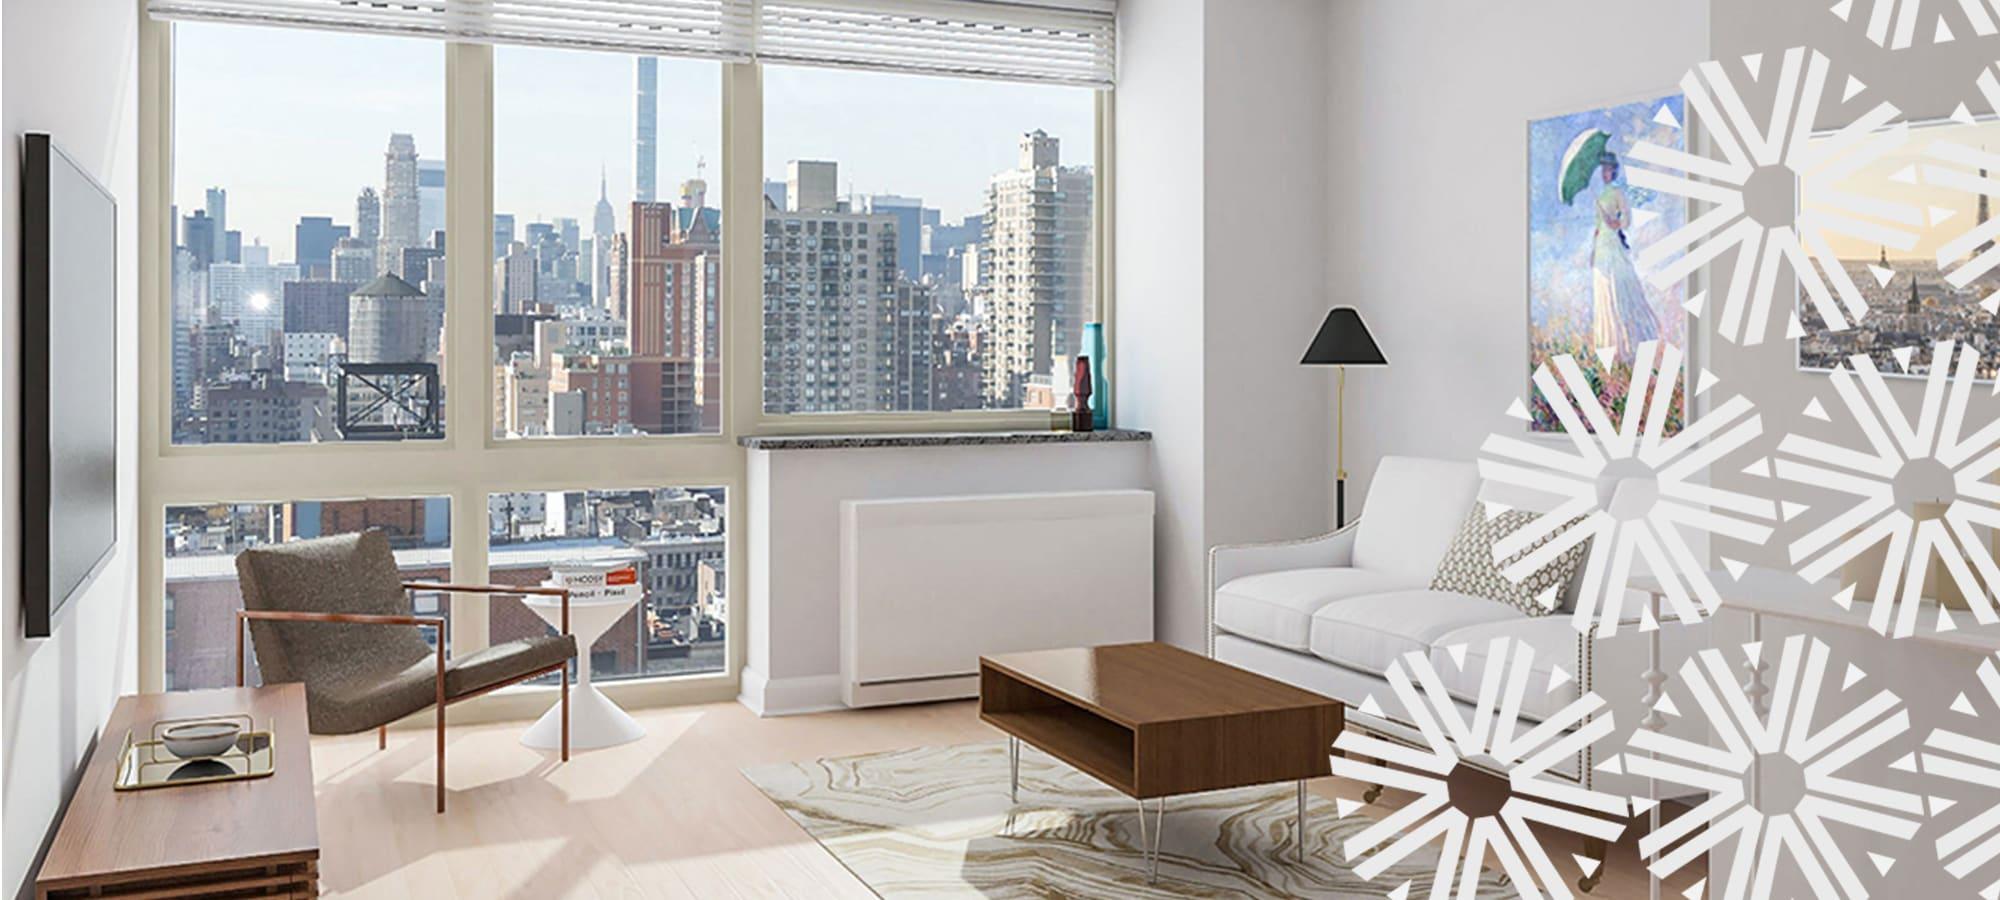 The Ventura Apartments in New York, New York